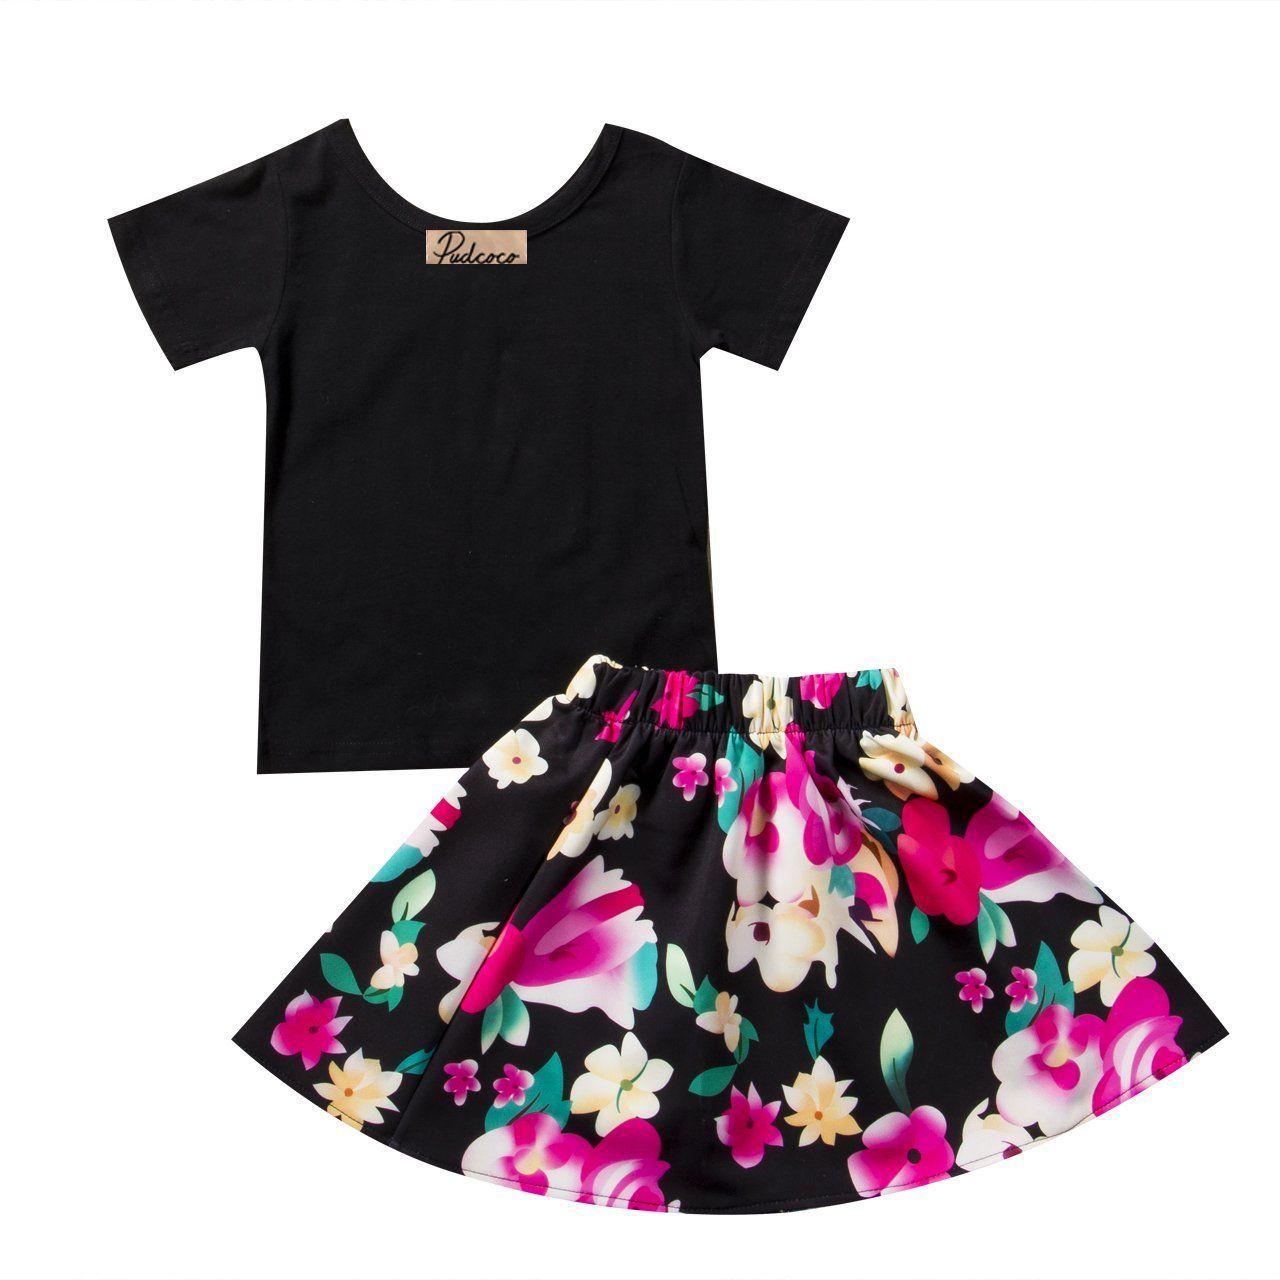 Floral toddler girl skirt set audreyus outfits pinterest skirt